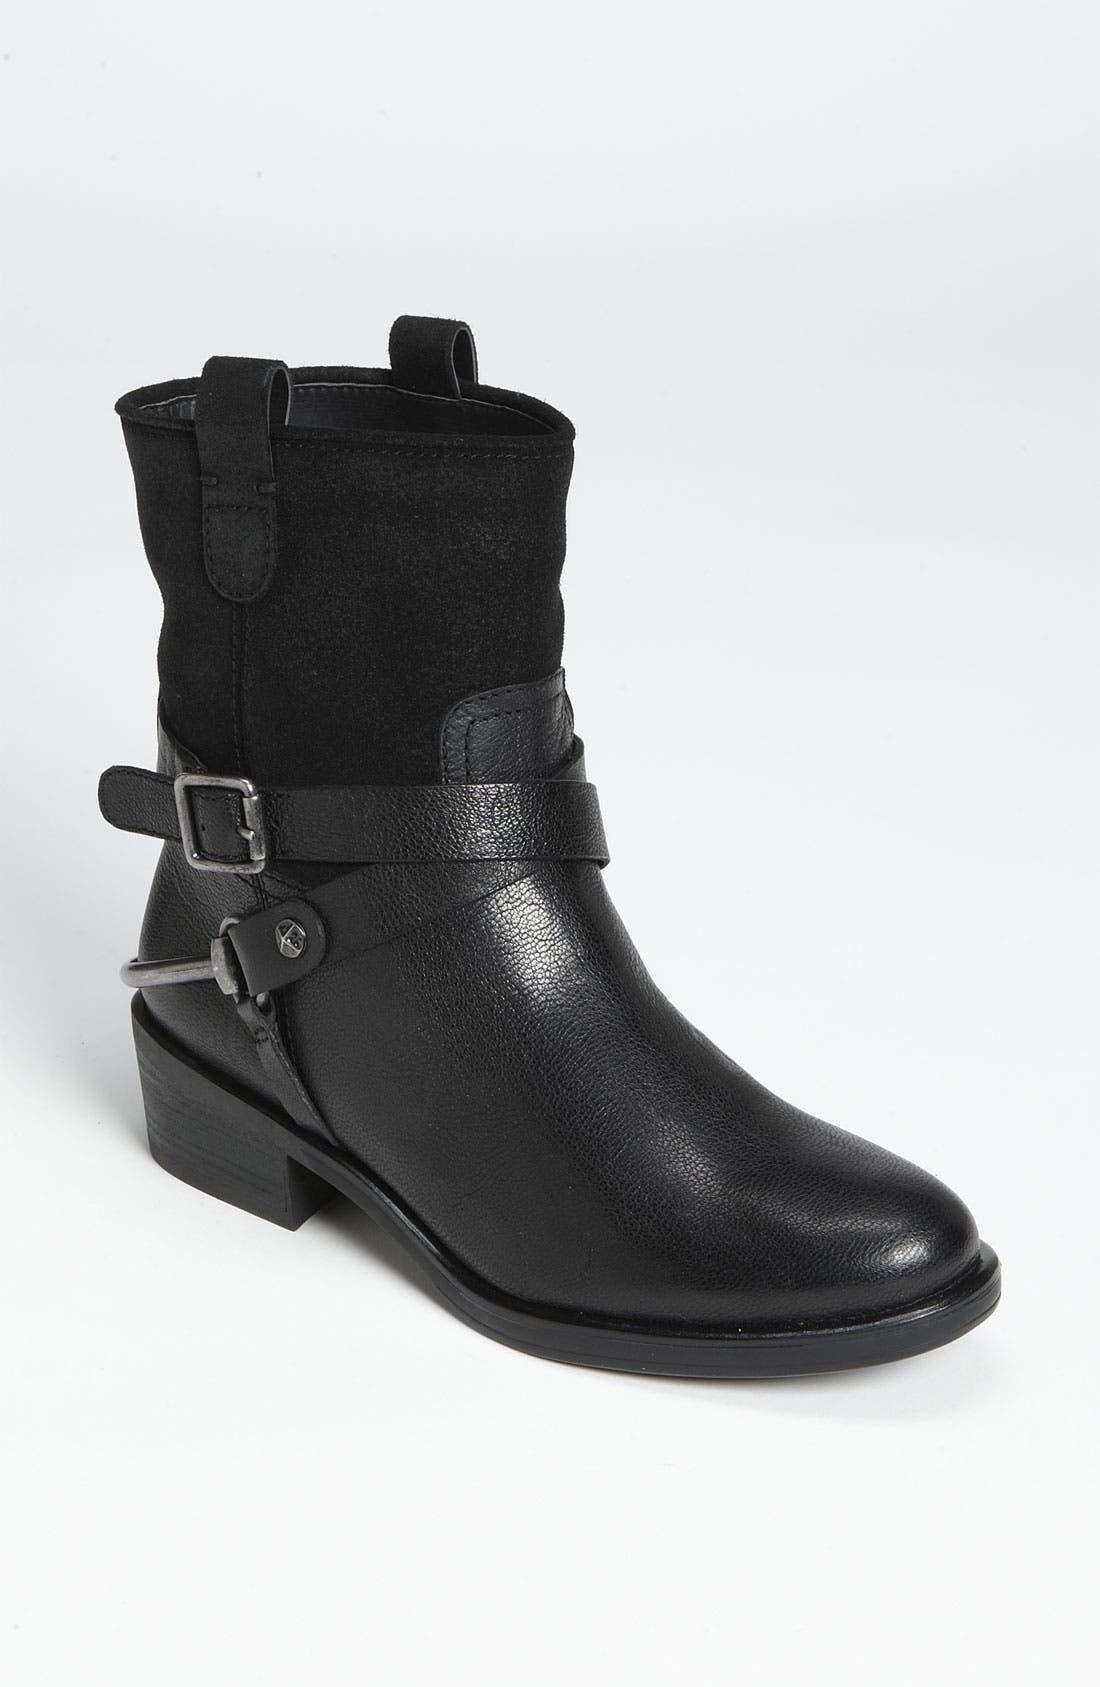 Alternate Image 1 Selected - Franco Sarto 'Beacon' Boot